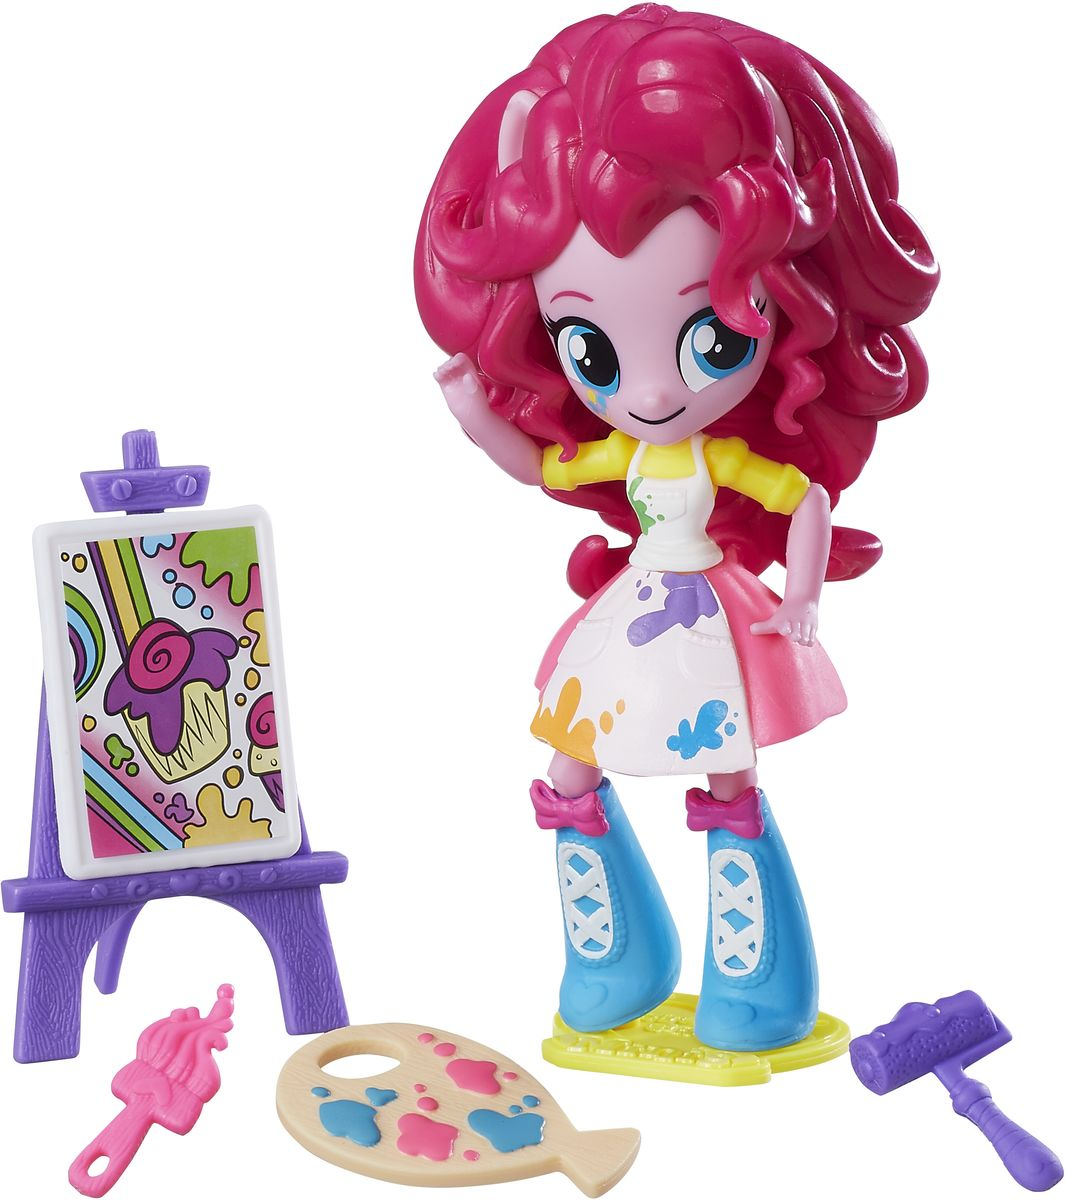 My Little Pony Equestria Girls Мини-кукла Pinkie Pie цена и фото